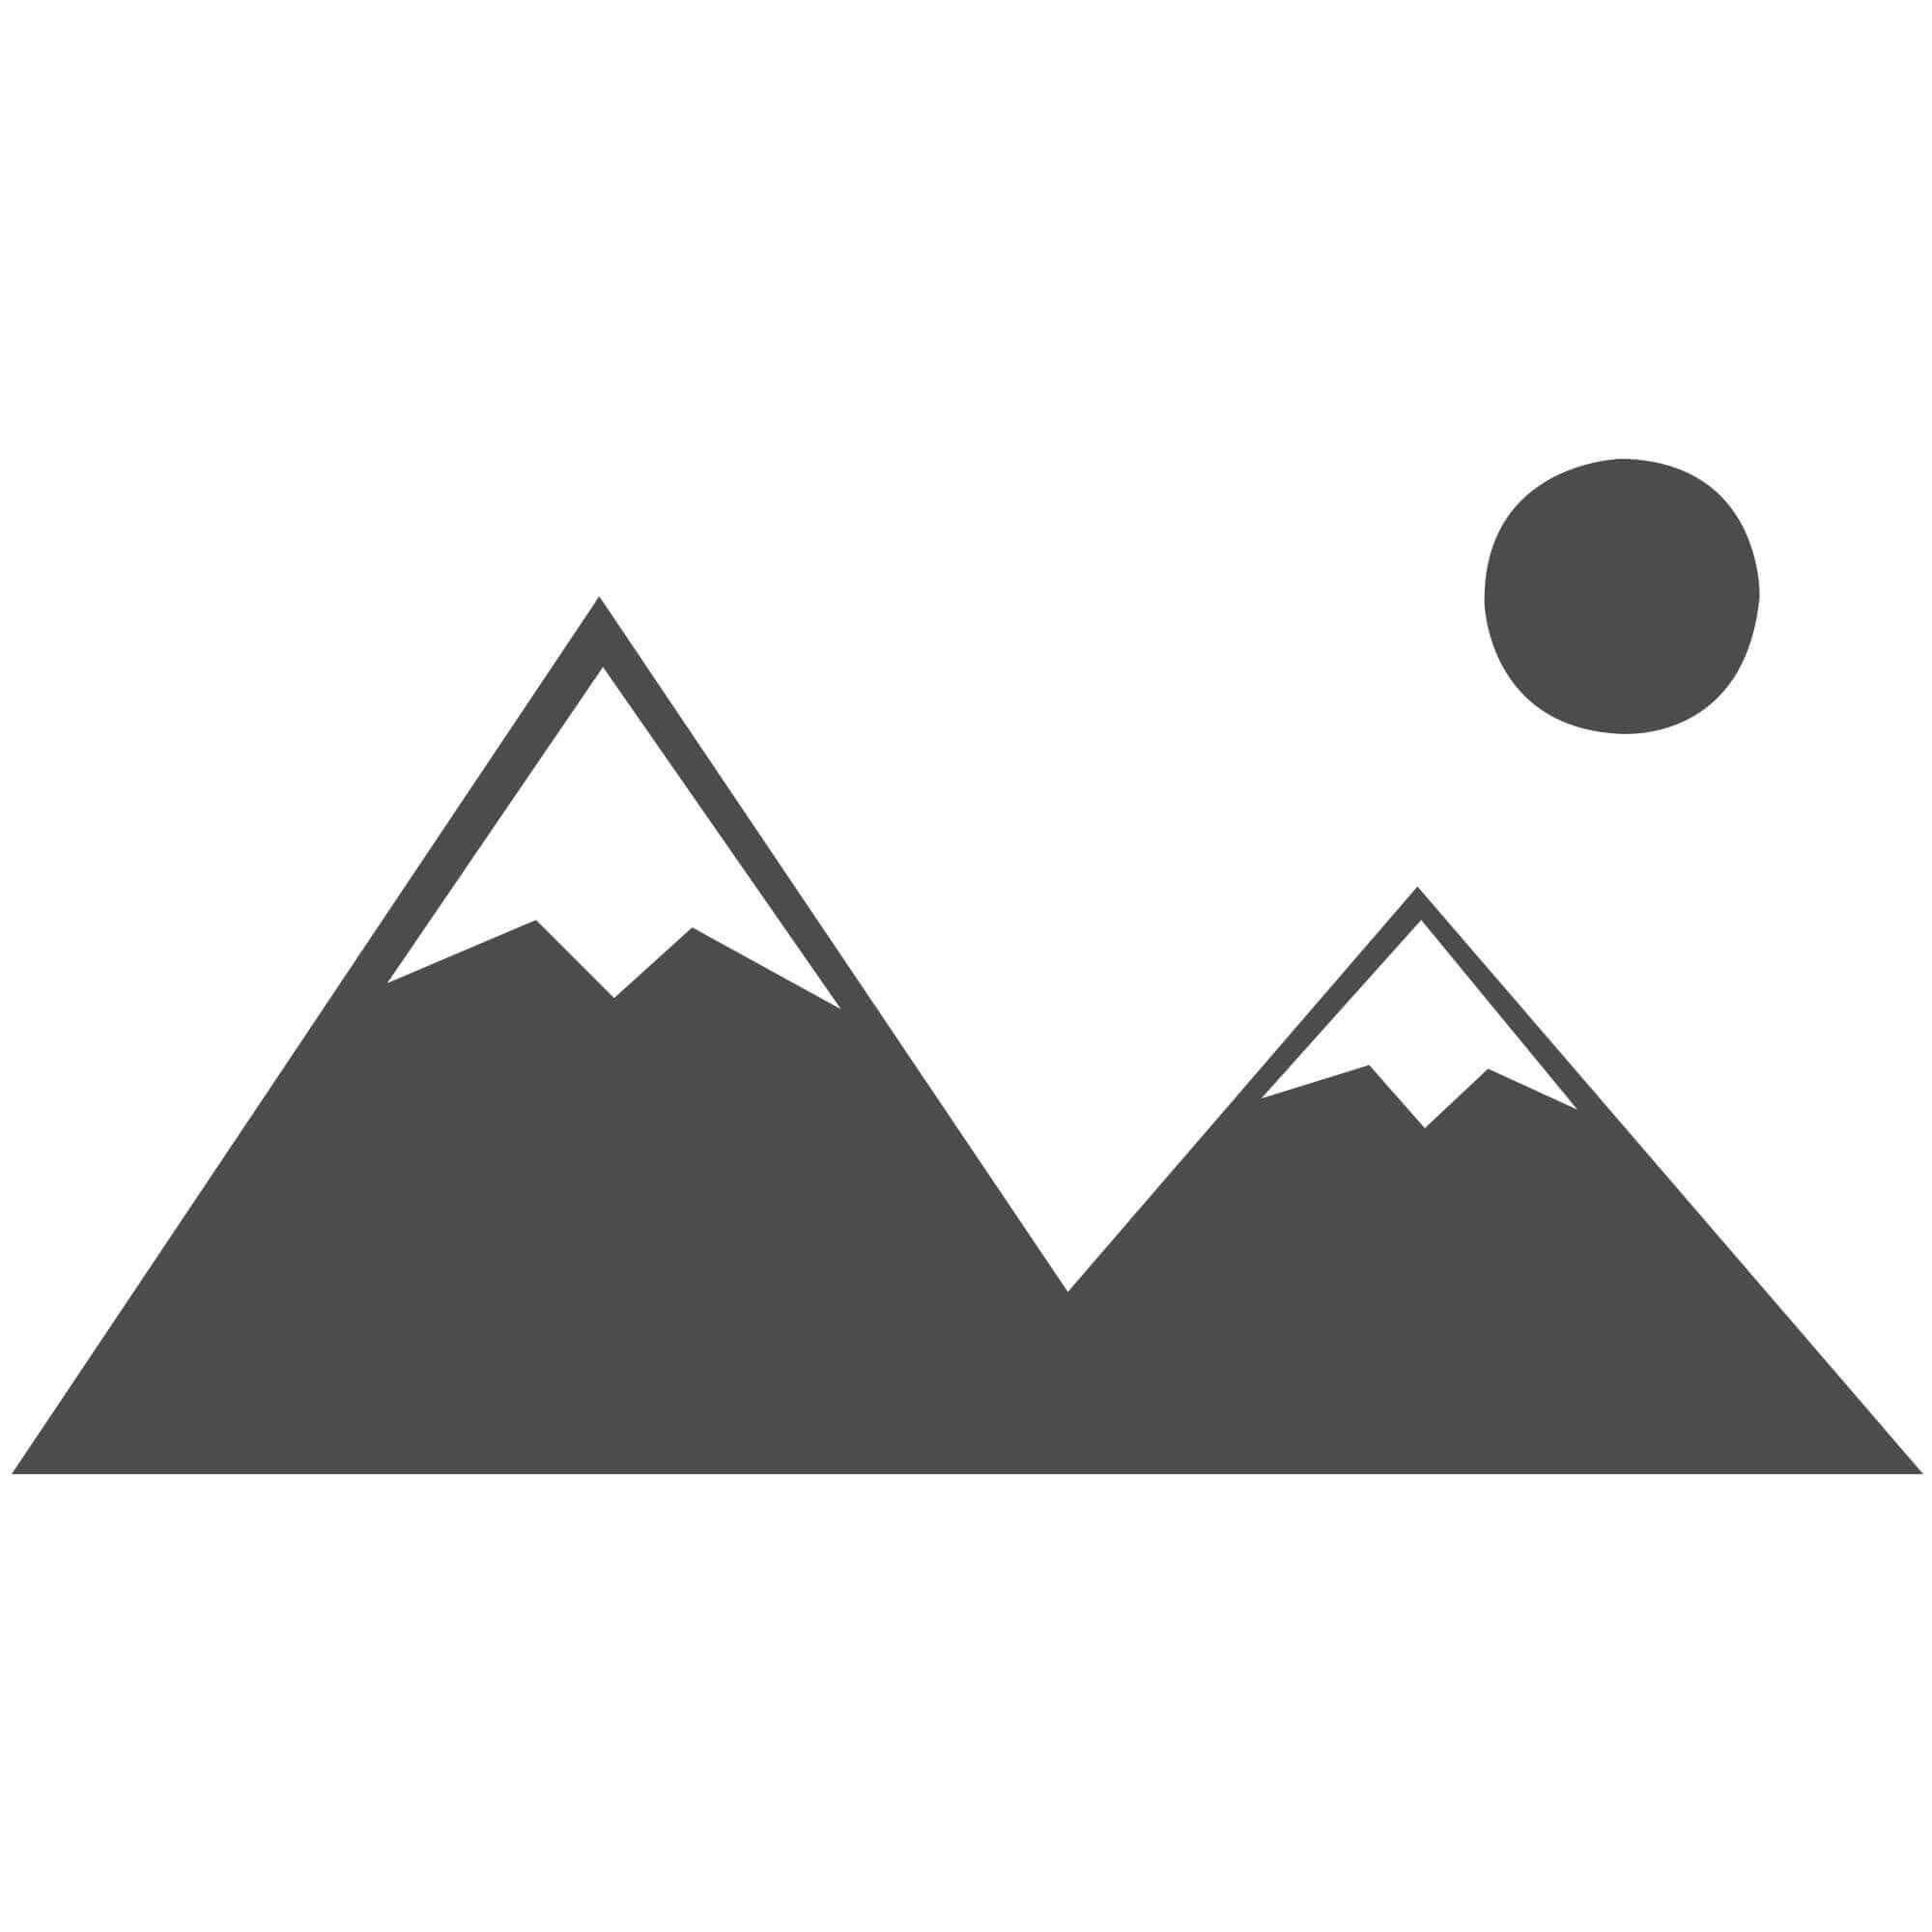 Stovax 4049 black & brass scuttle